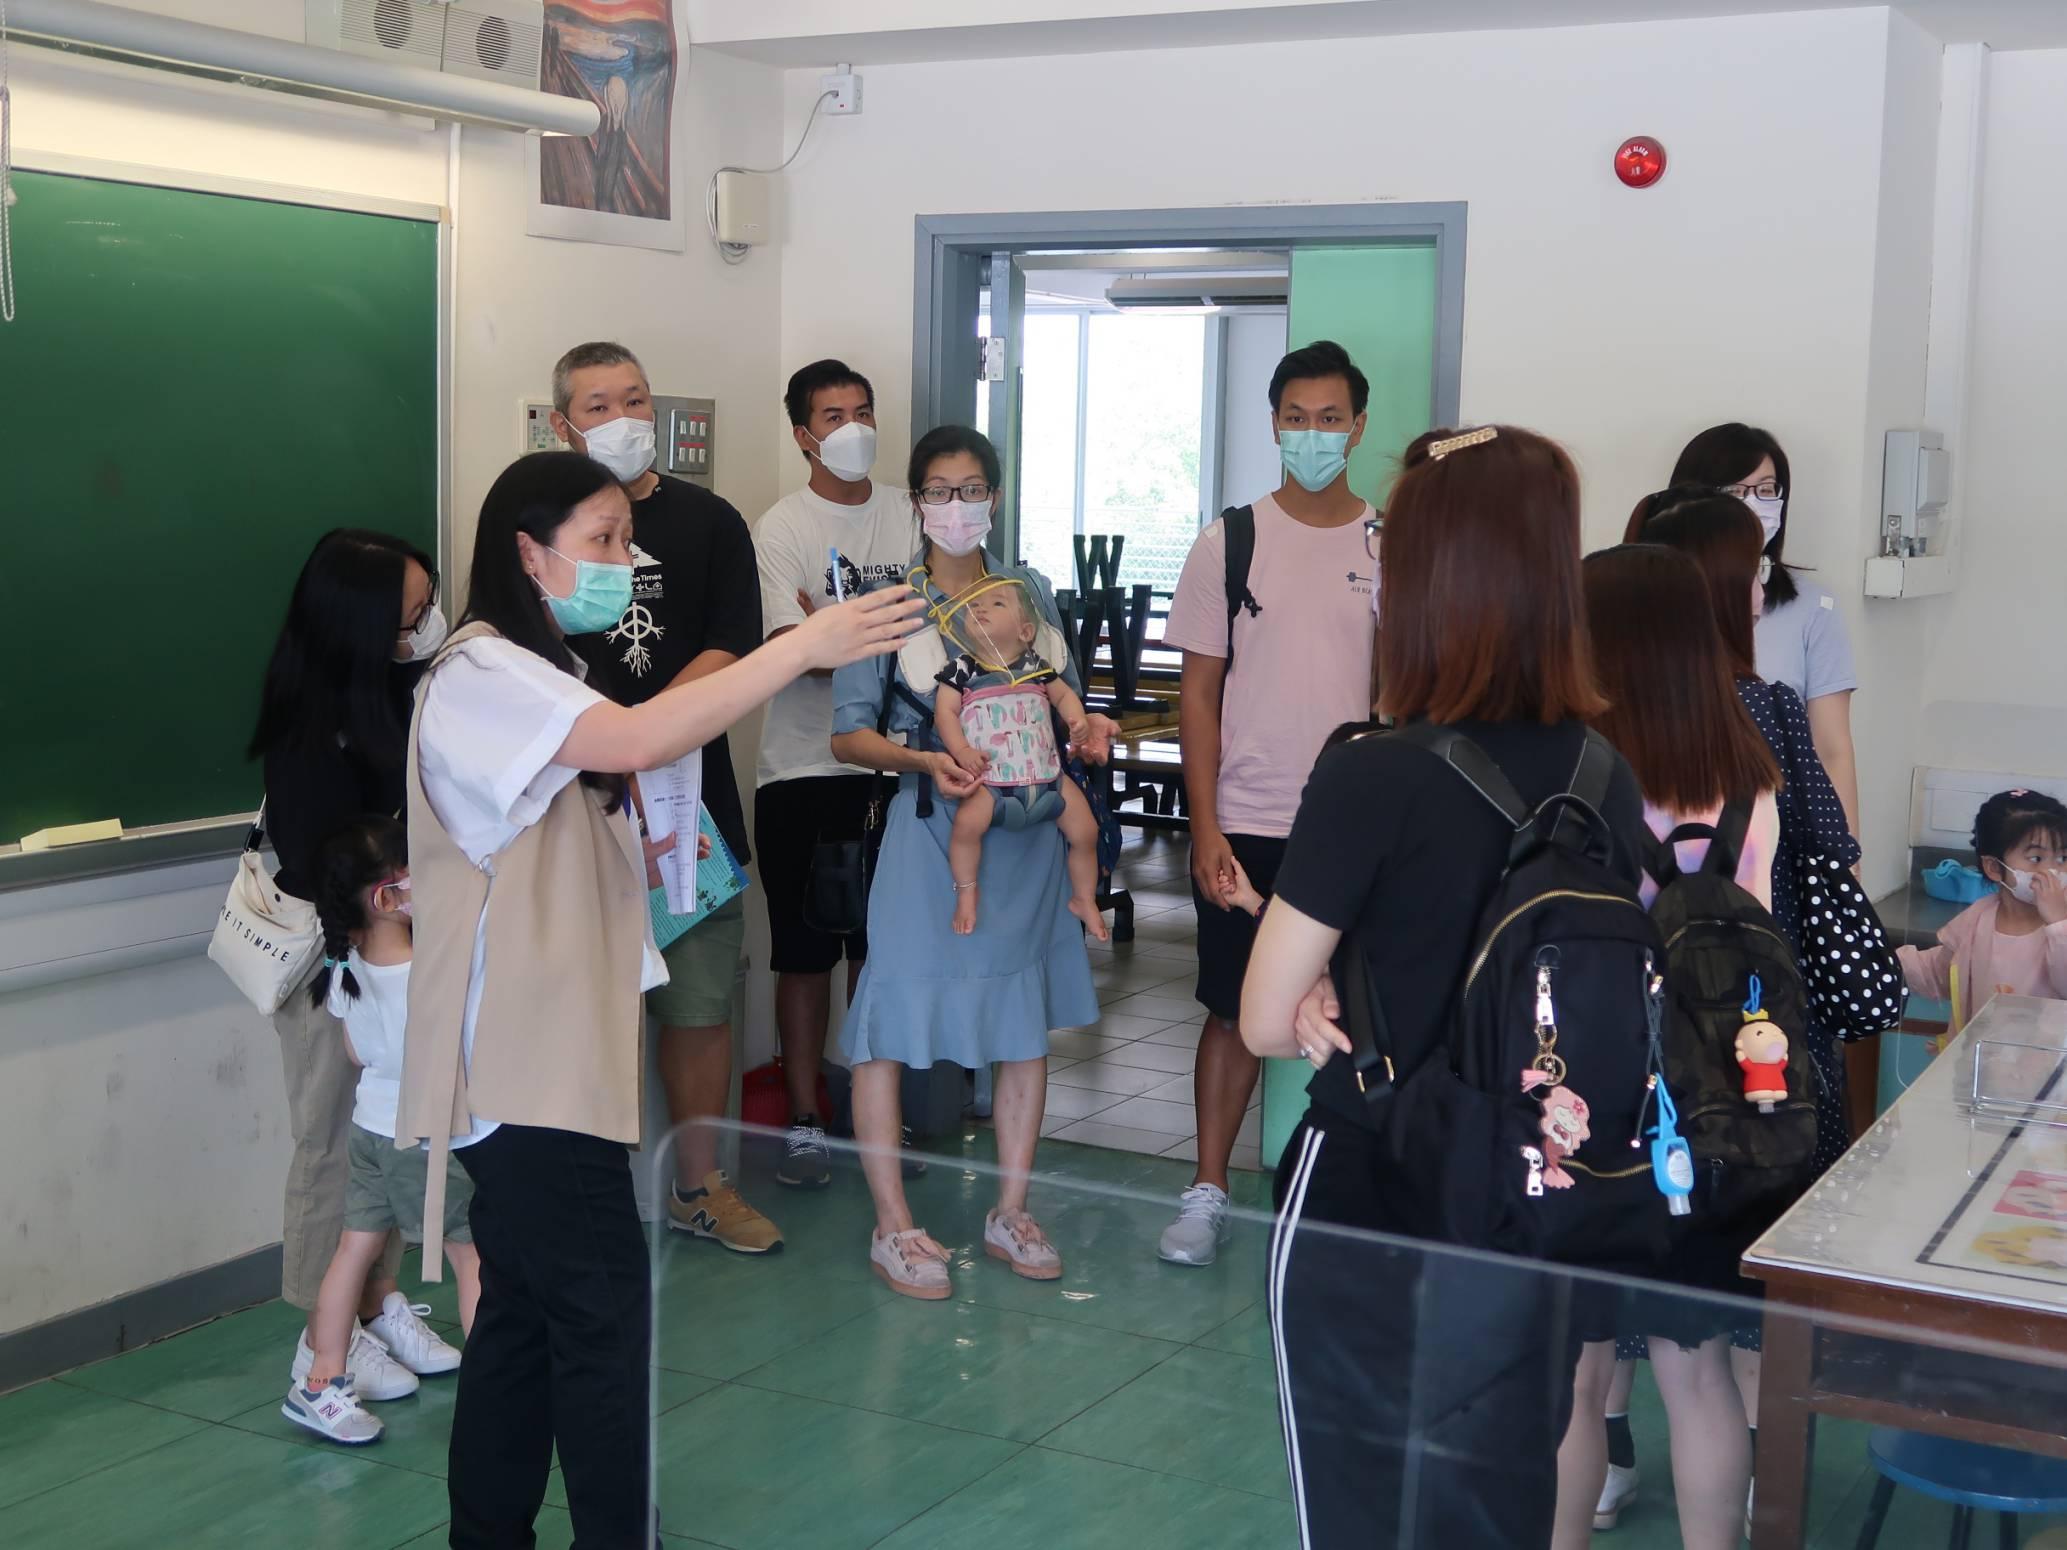 https://syh.edu.hk/sites/default/files/img_7406.jpg